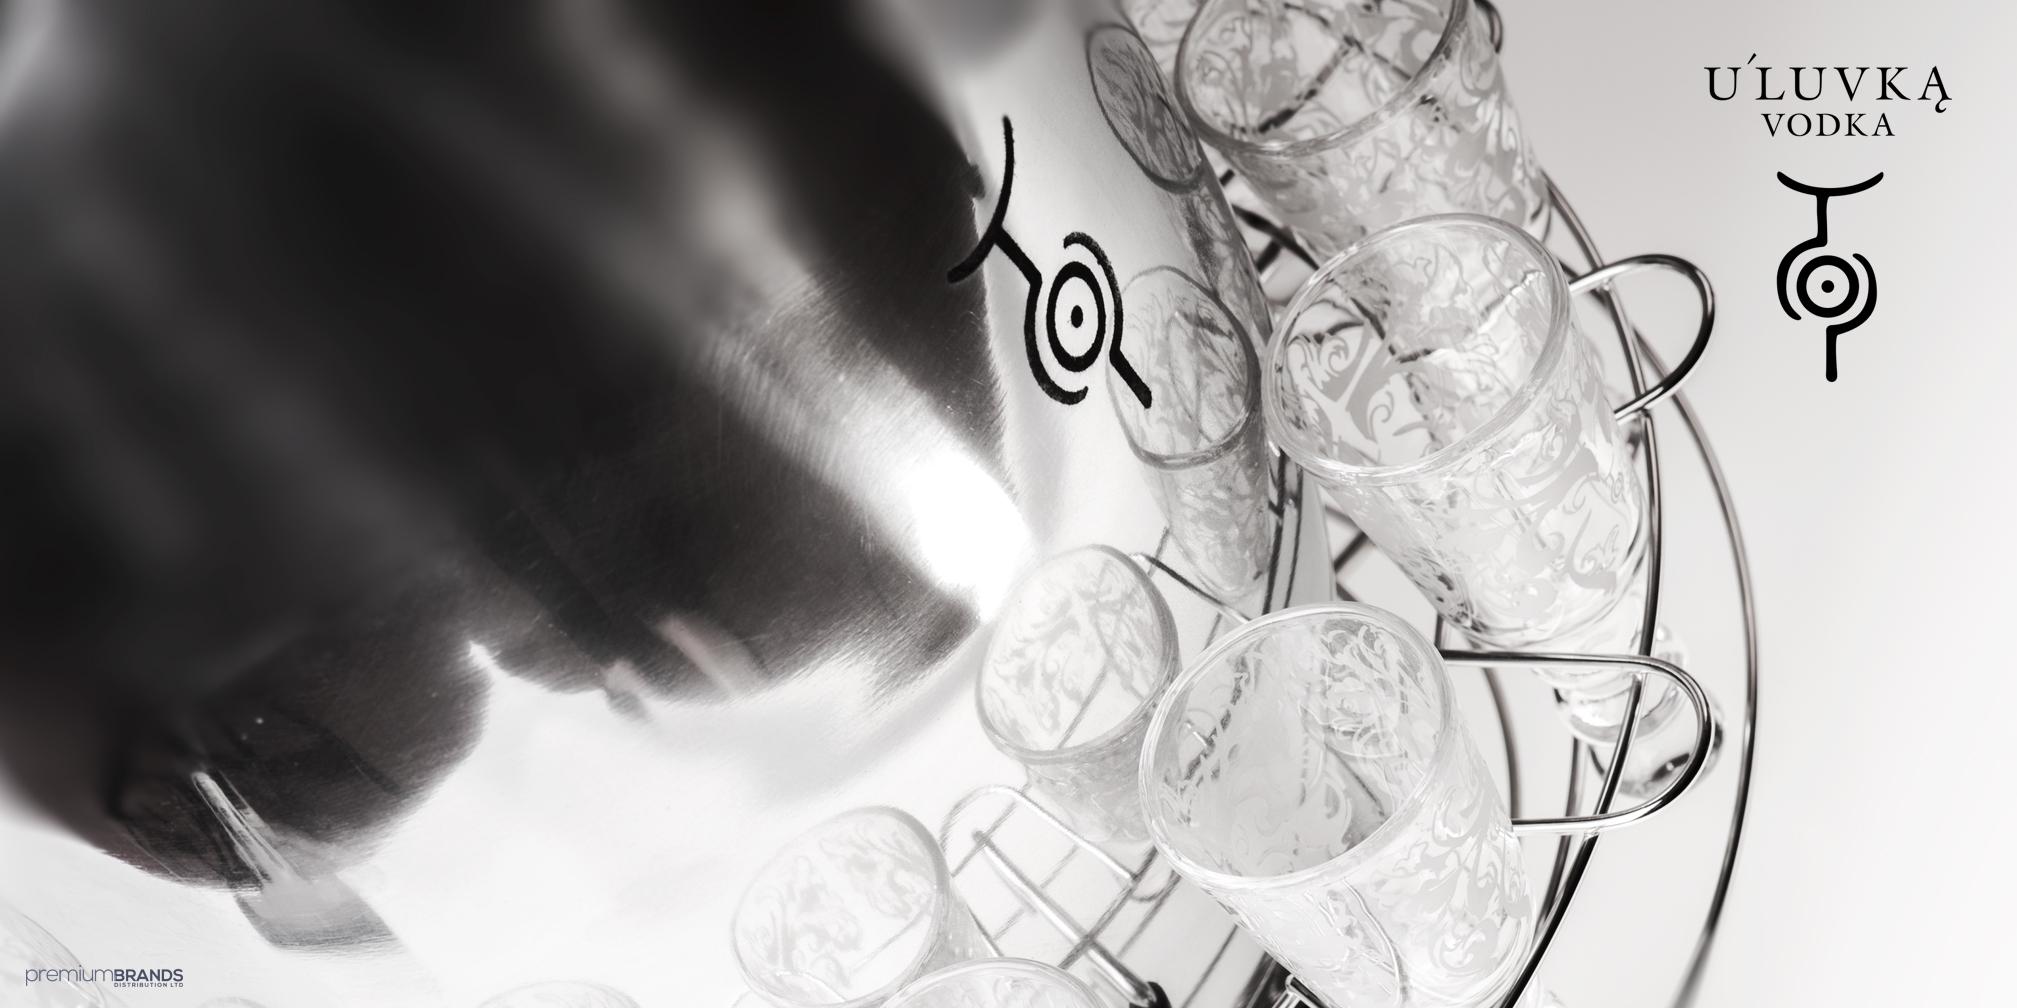 uluvka_vodka.jpg